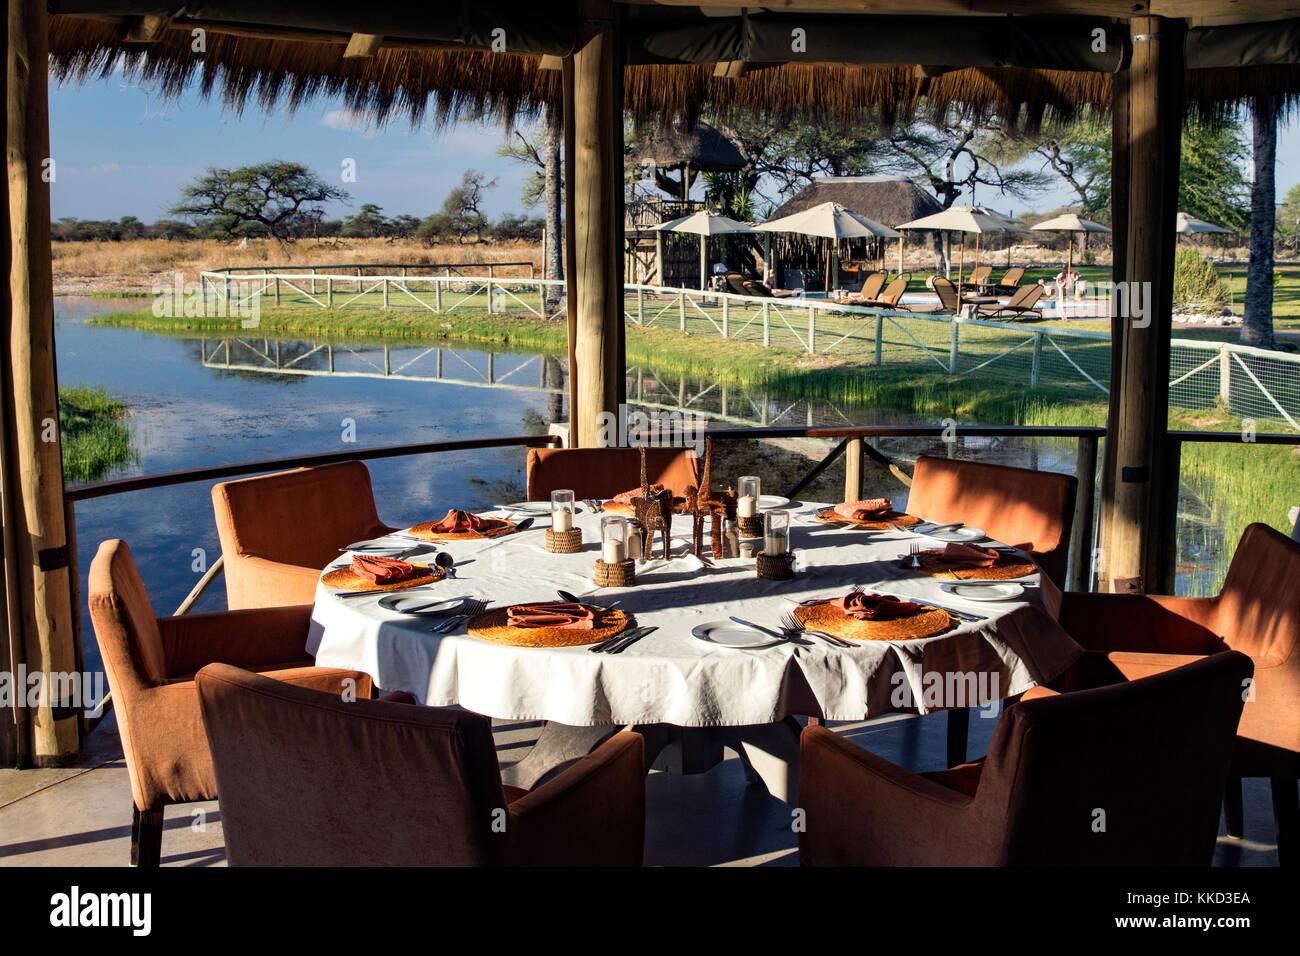 Outdoor dining at Onguma Bush Camp, Onguma Game Reserve, Namibia, Africa - Stock Image